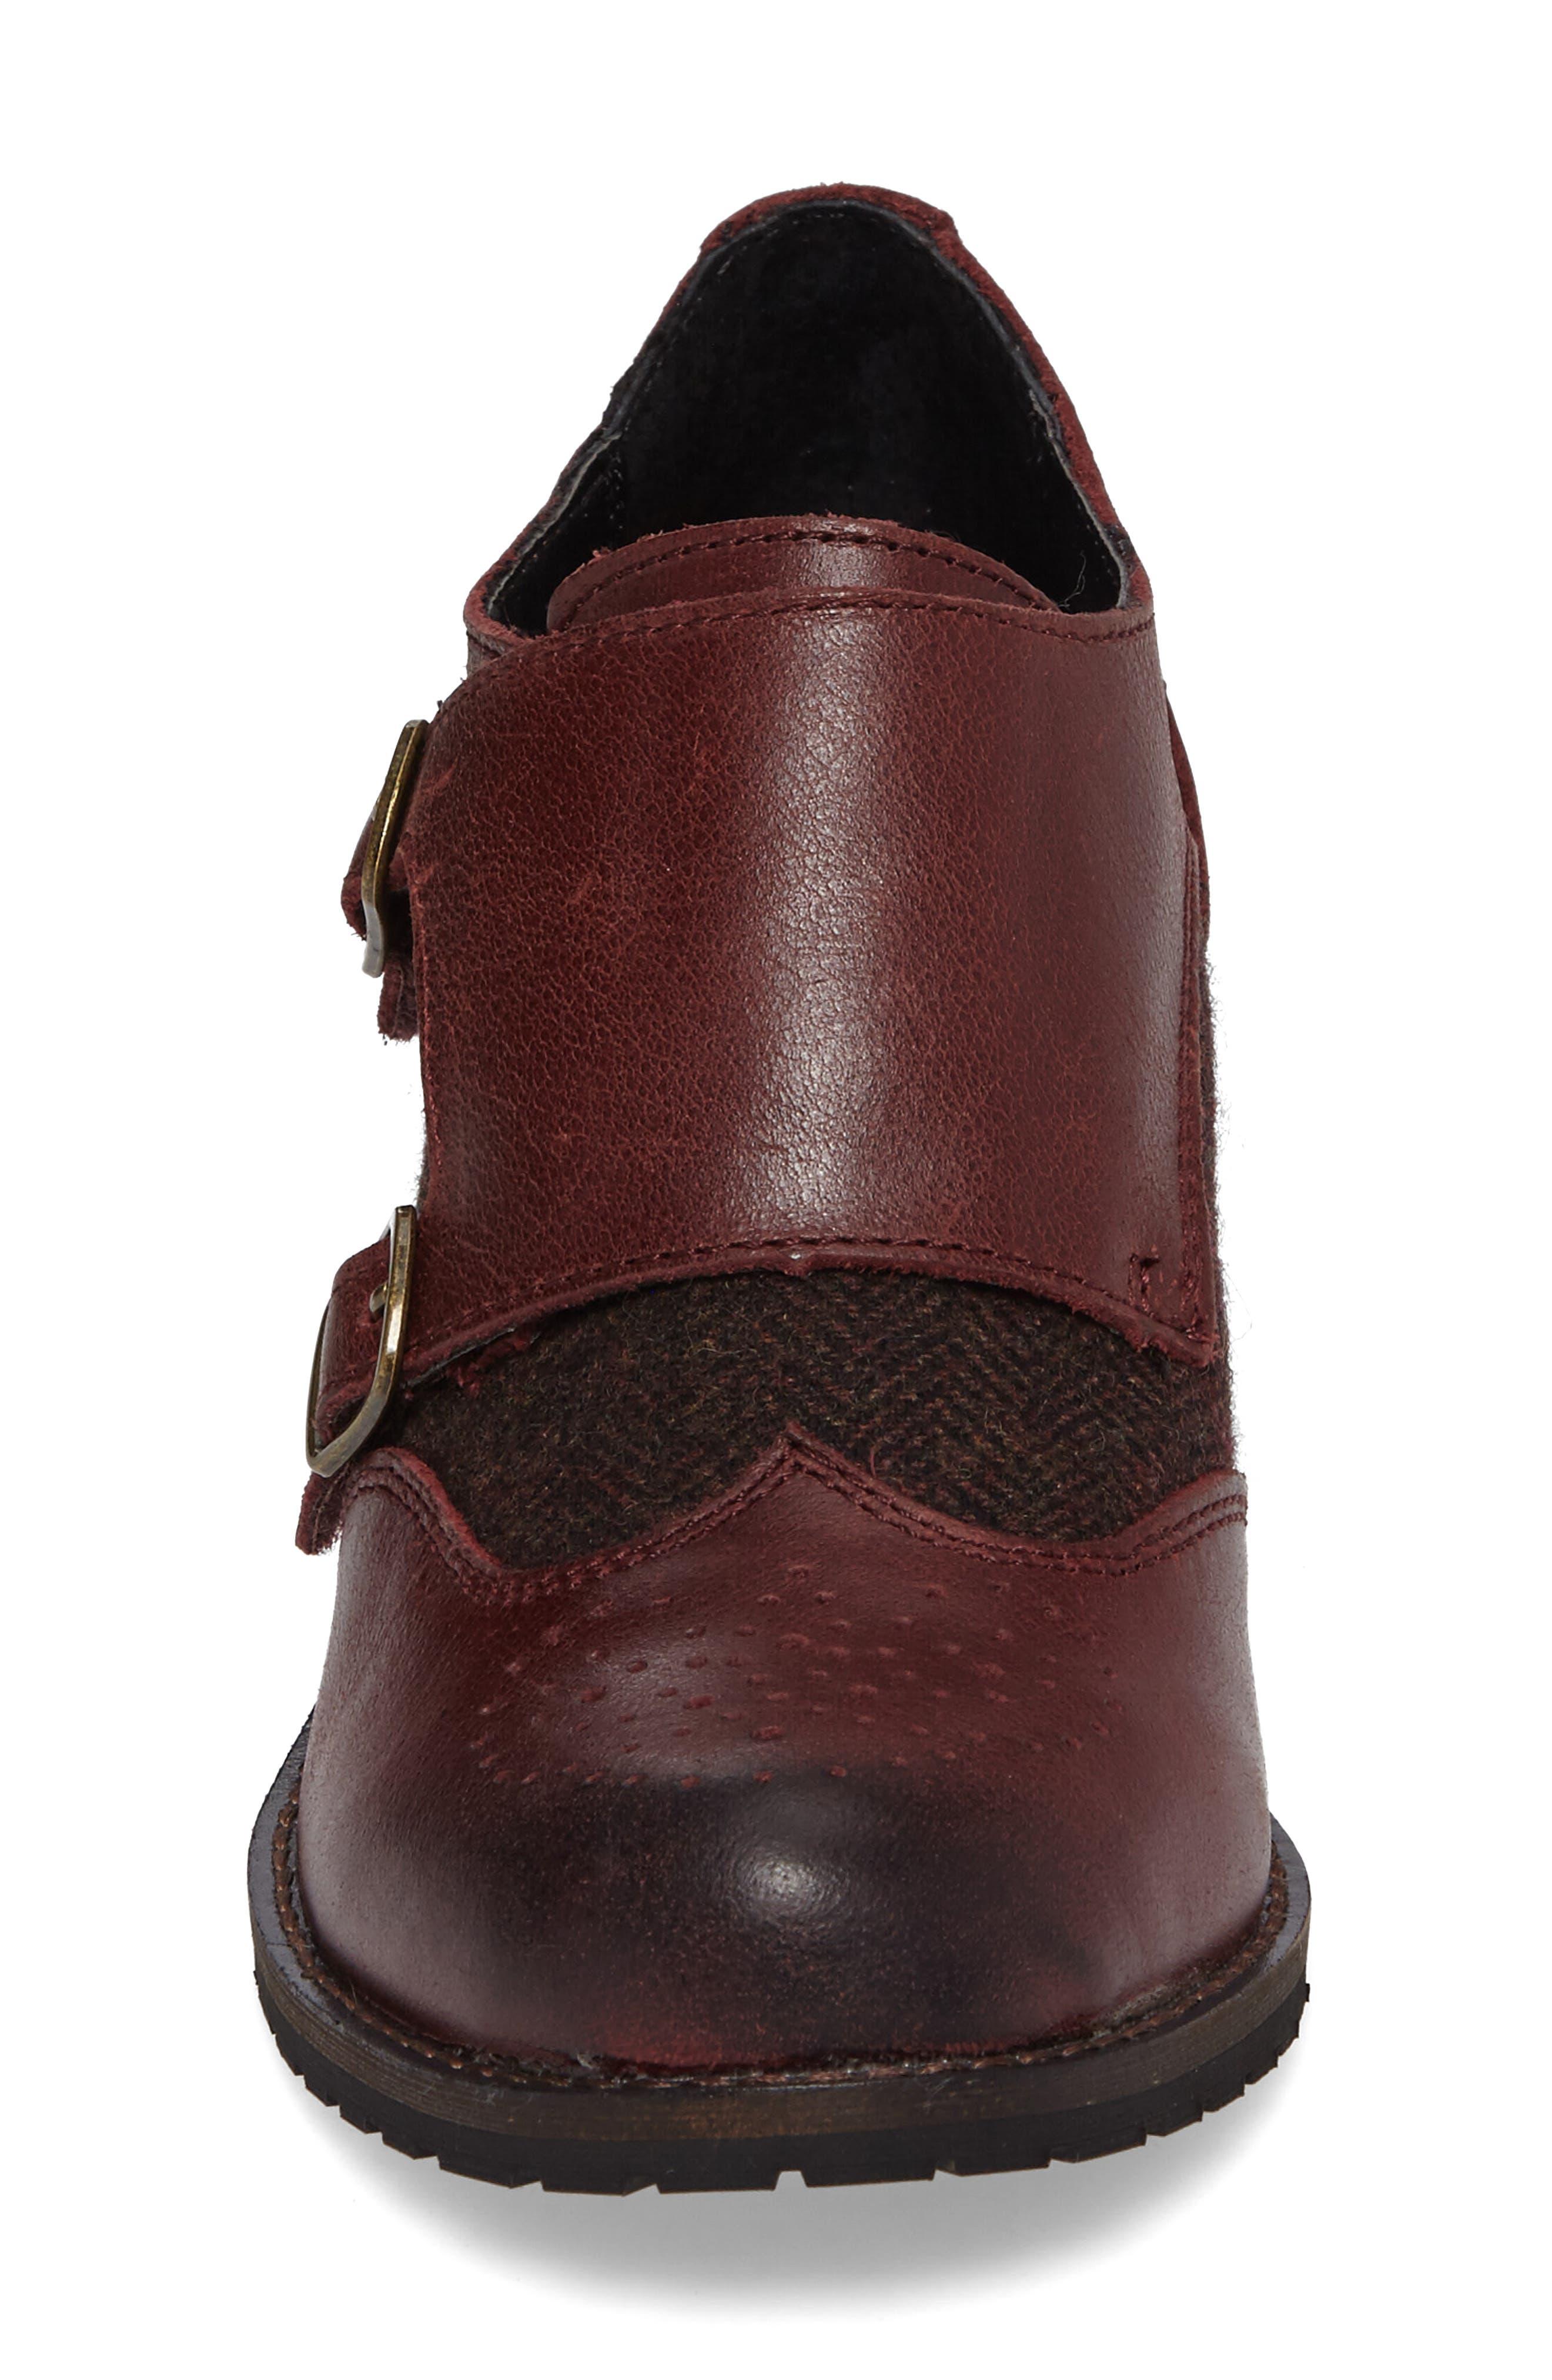 Dina Double Monk Strap Ankle Boot,                             Alternate thumbnail 4, color,                             Merlot Leather